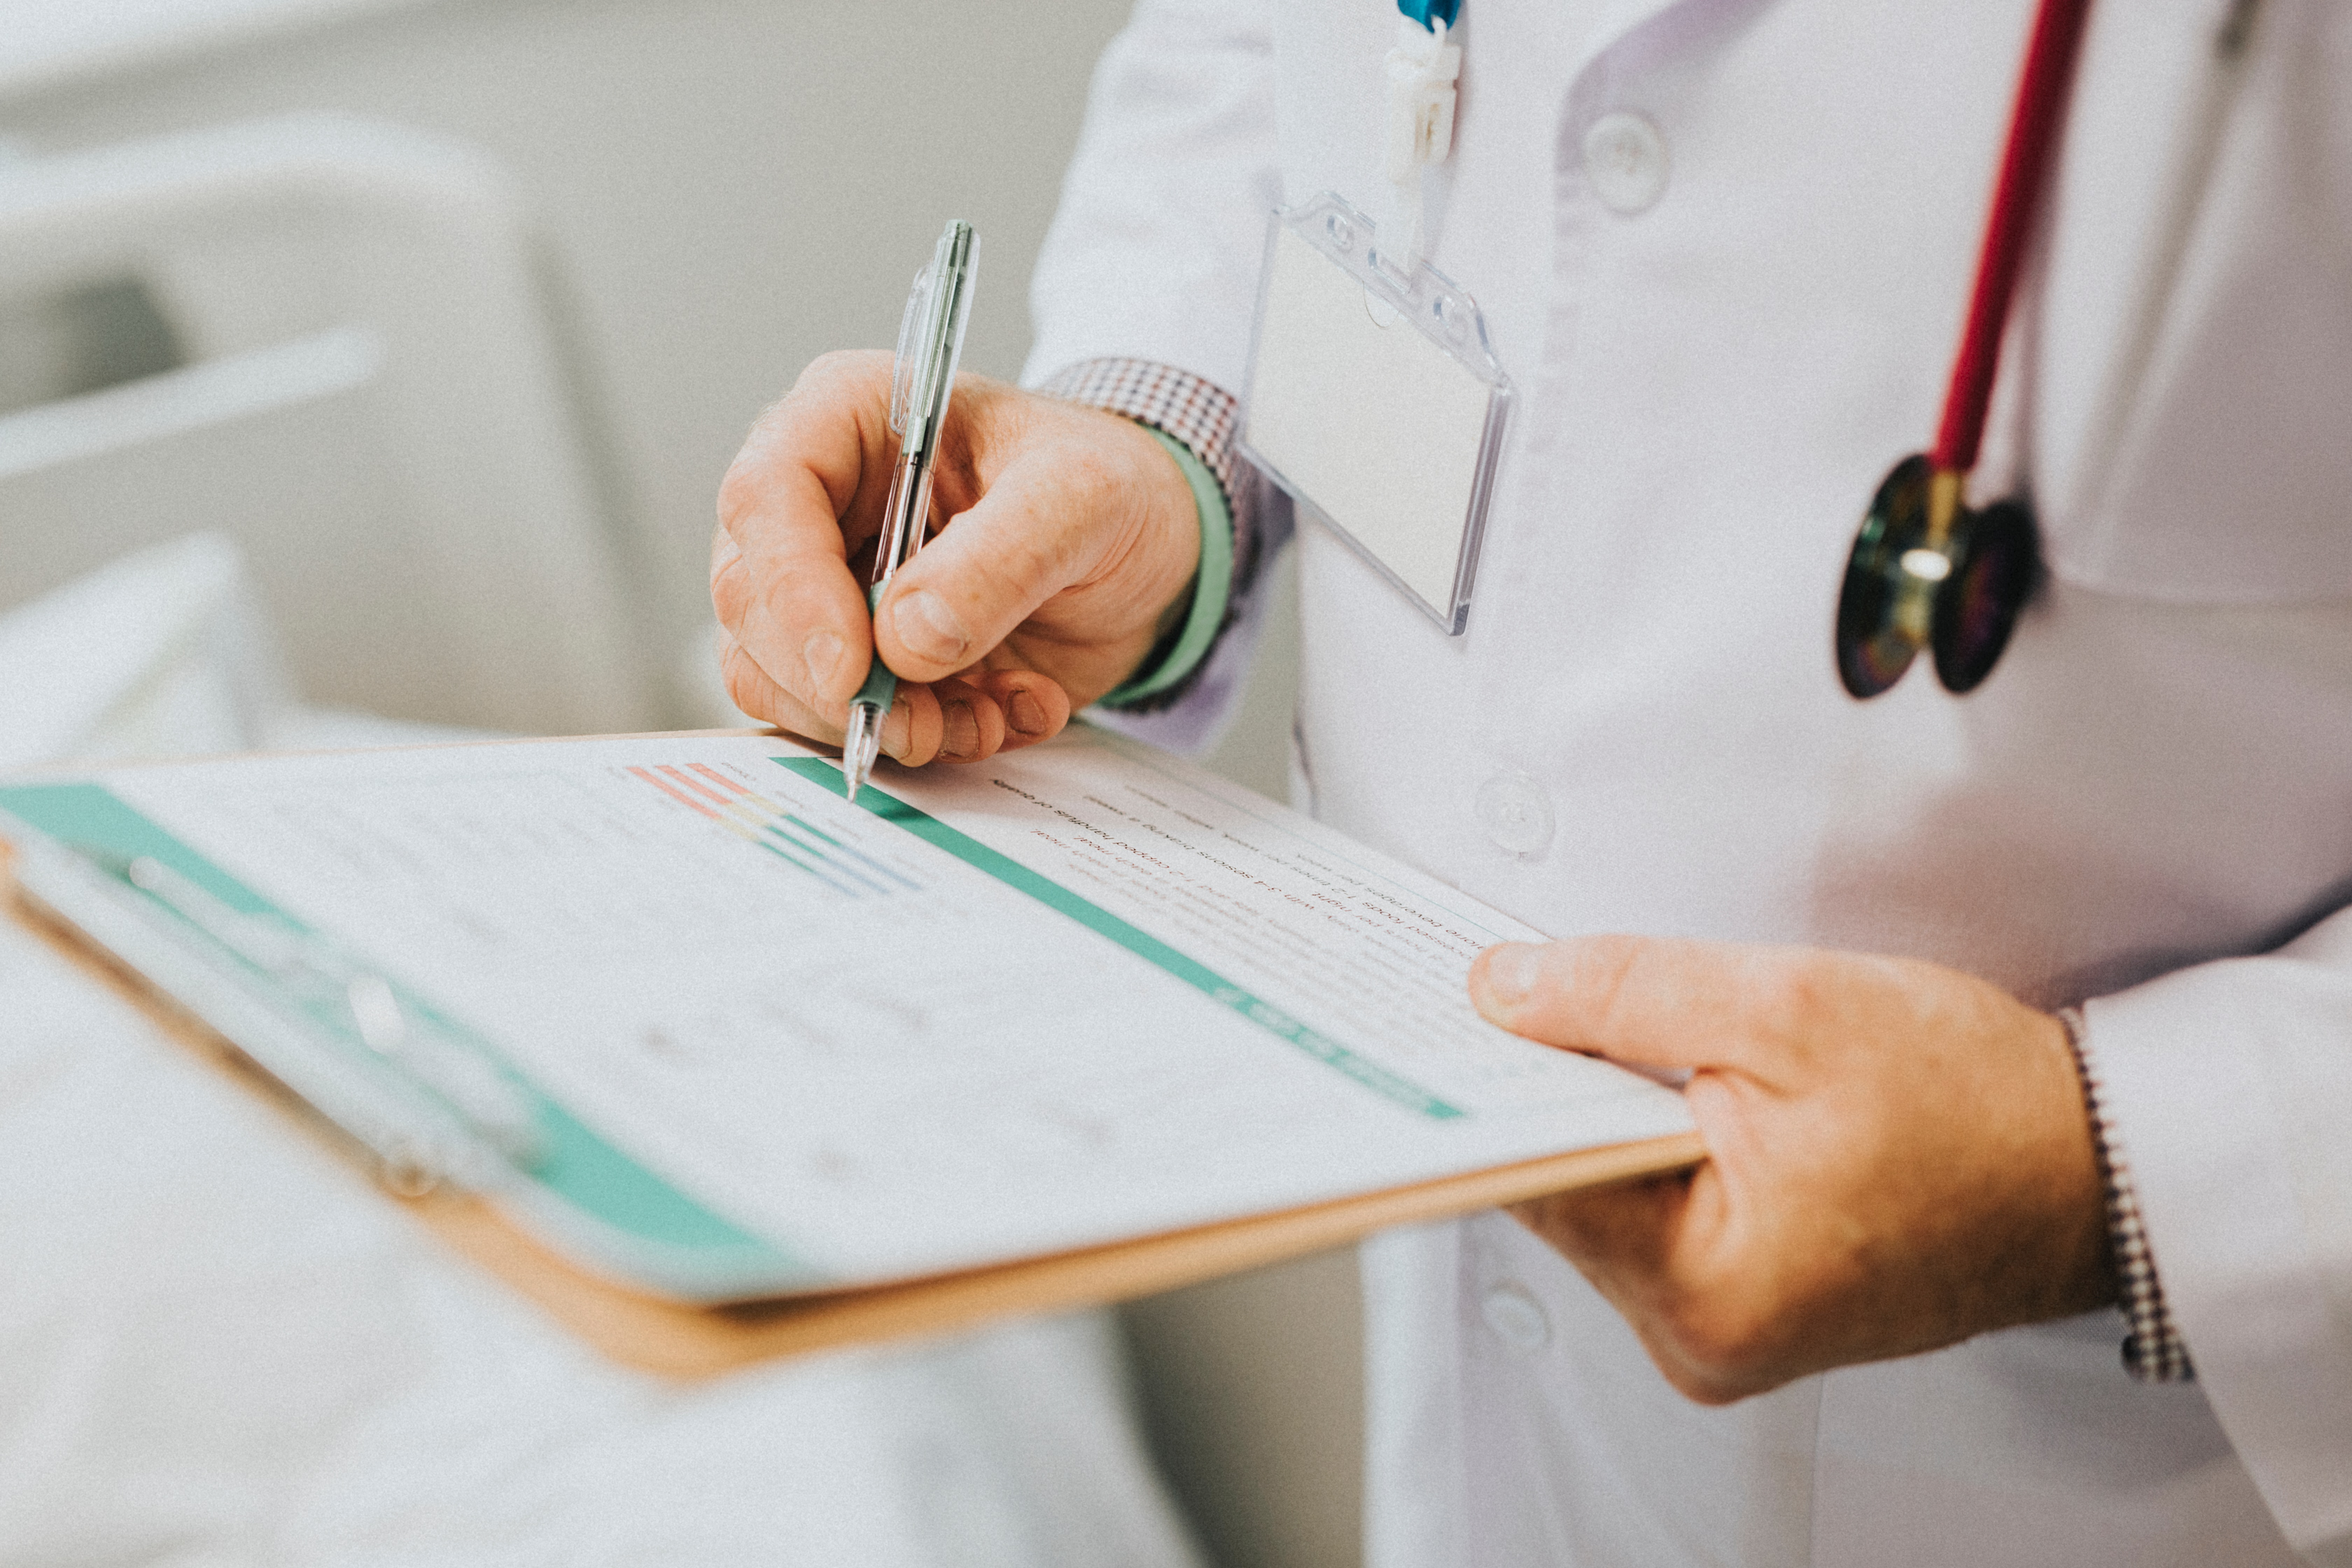 Data management to improve patient care